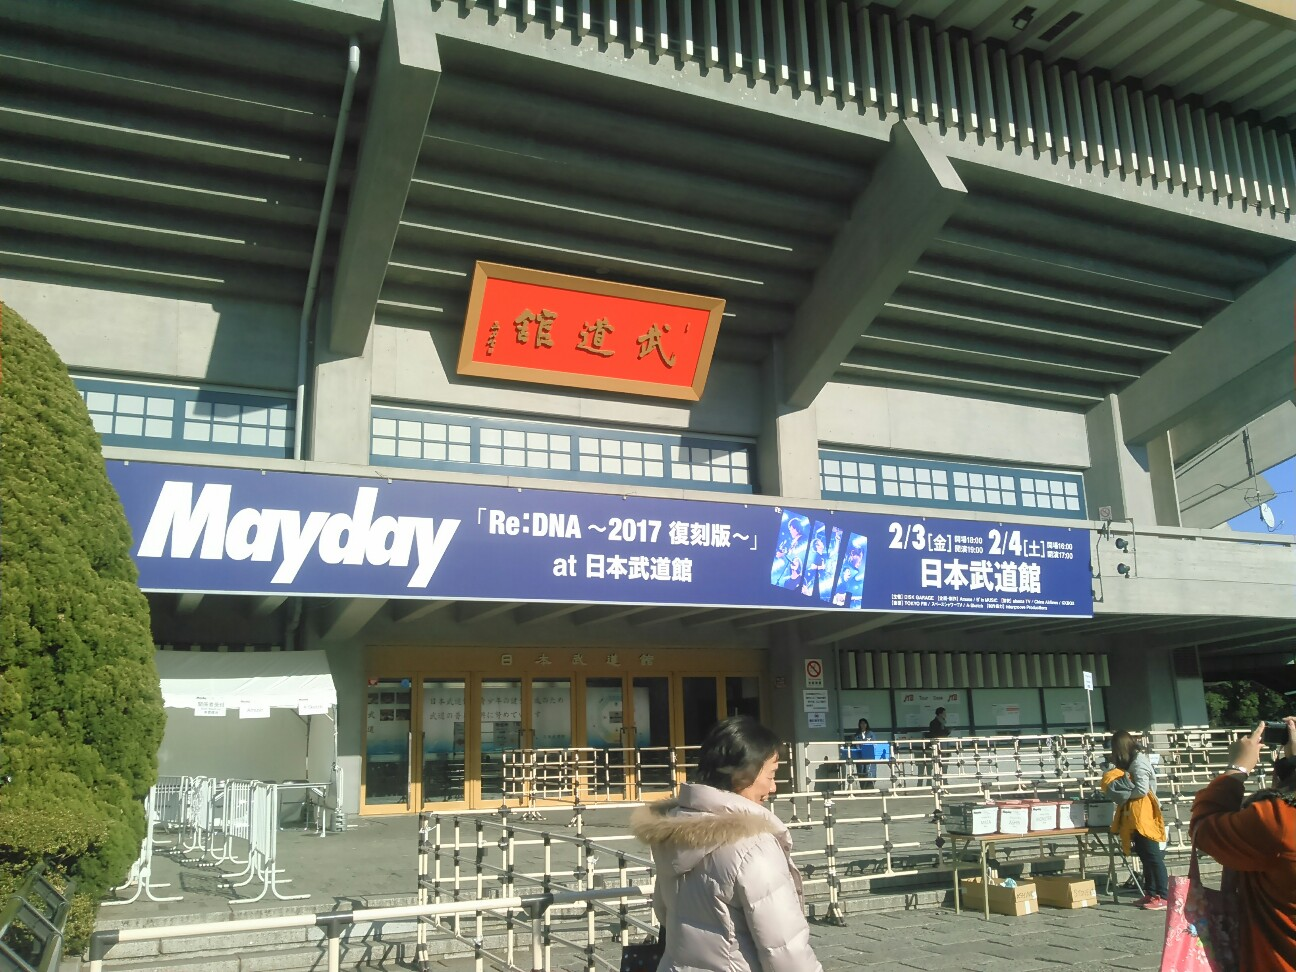 f:id:heizhimatangyuan:20170205165009j:image